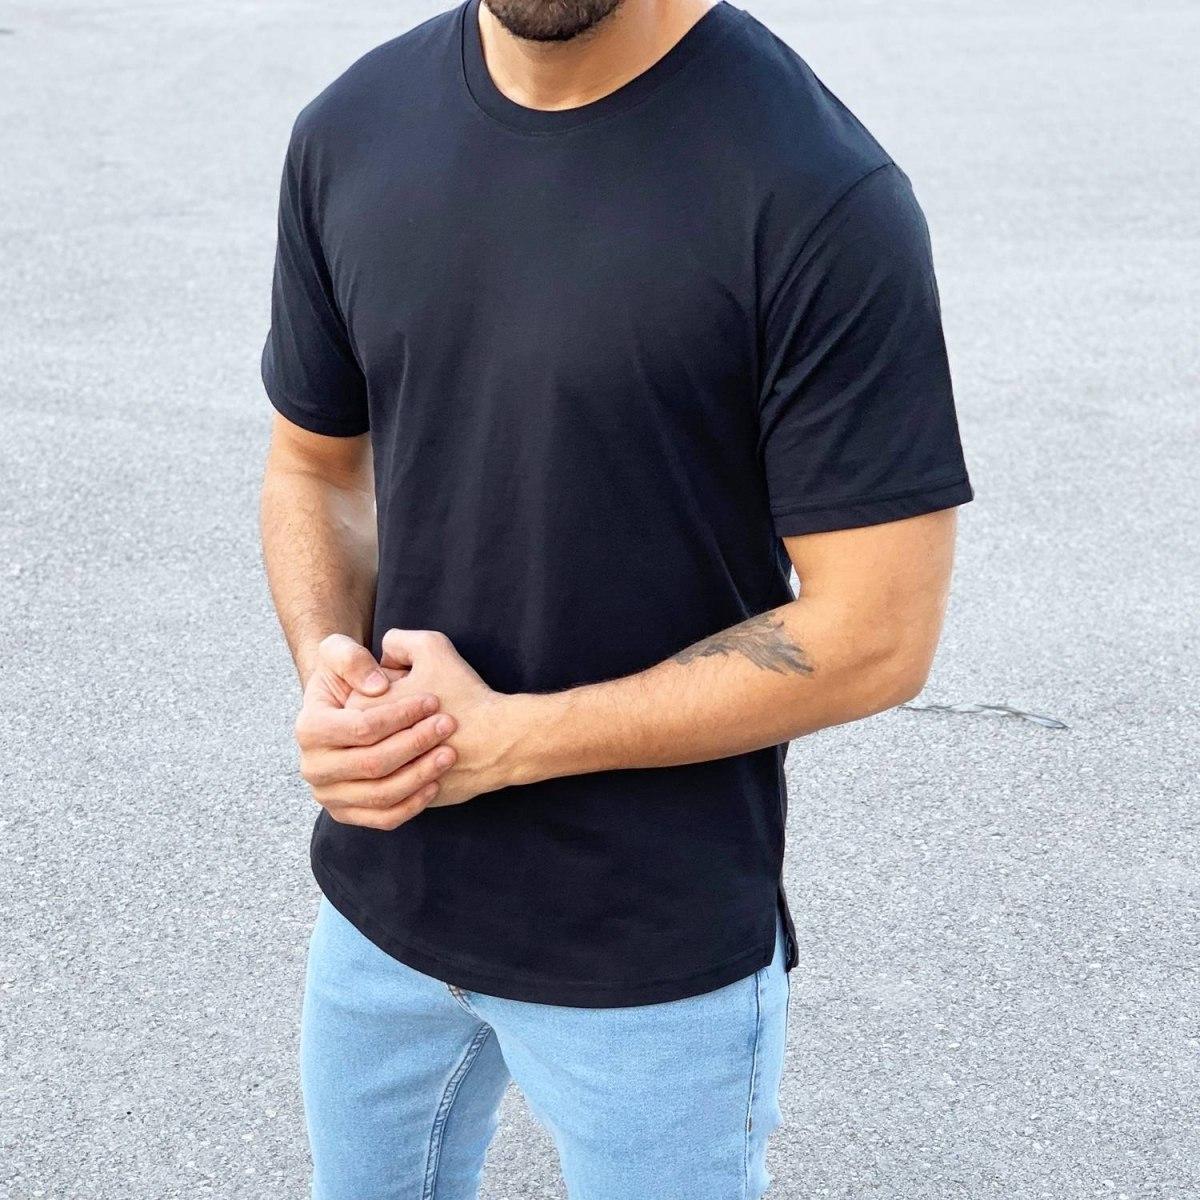 Men's Basic Round Neck T-Shirt In New Black